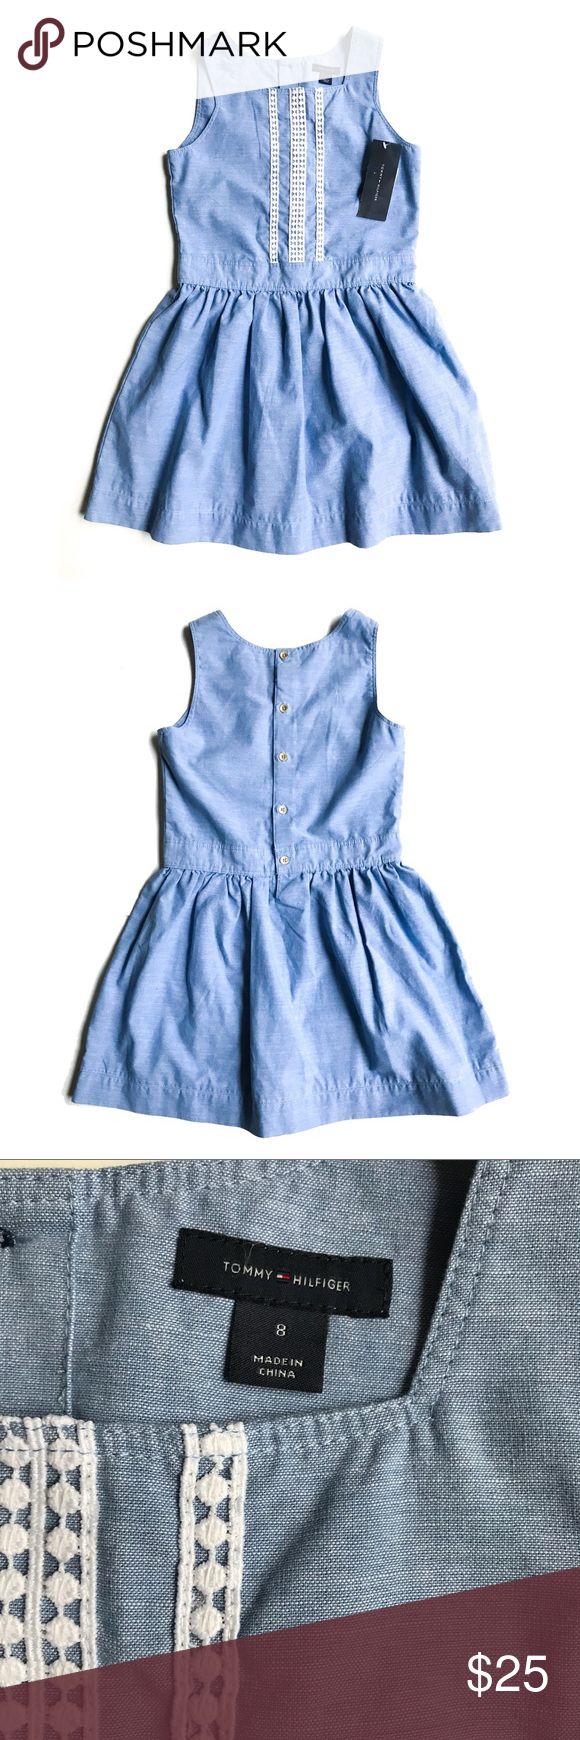 "Tommy Hilfiger Crochet Border Blue Haze Dress Sz 8 Tommy Hilfiger Crochet Border Blue Haze Dress Sz 8  New with Tags Sleeveless Girls Dress  Button Back Square Neckline Gathered Skirt Dress Length 28.5"" Tommy Hilfiger Dresses"